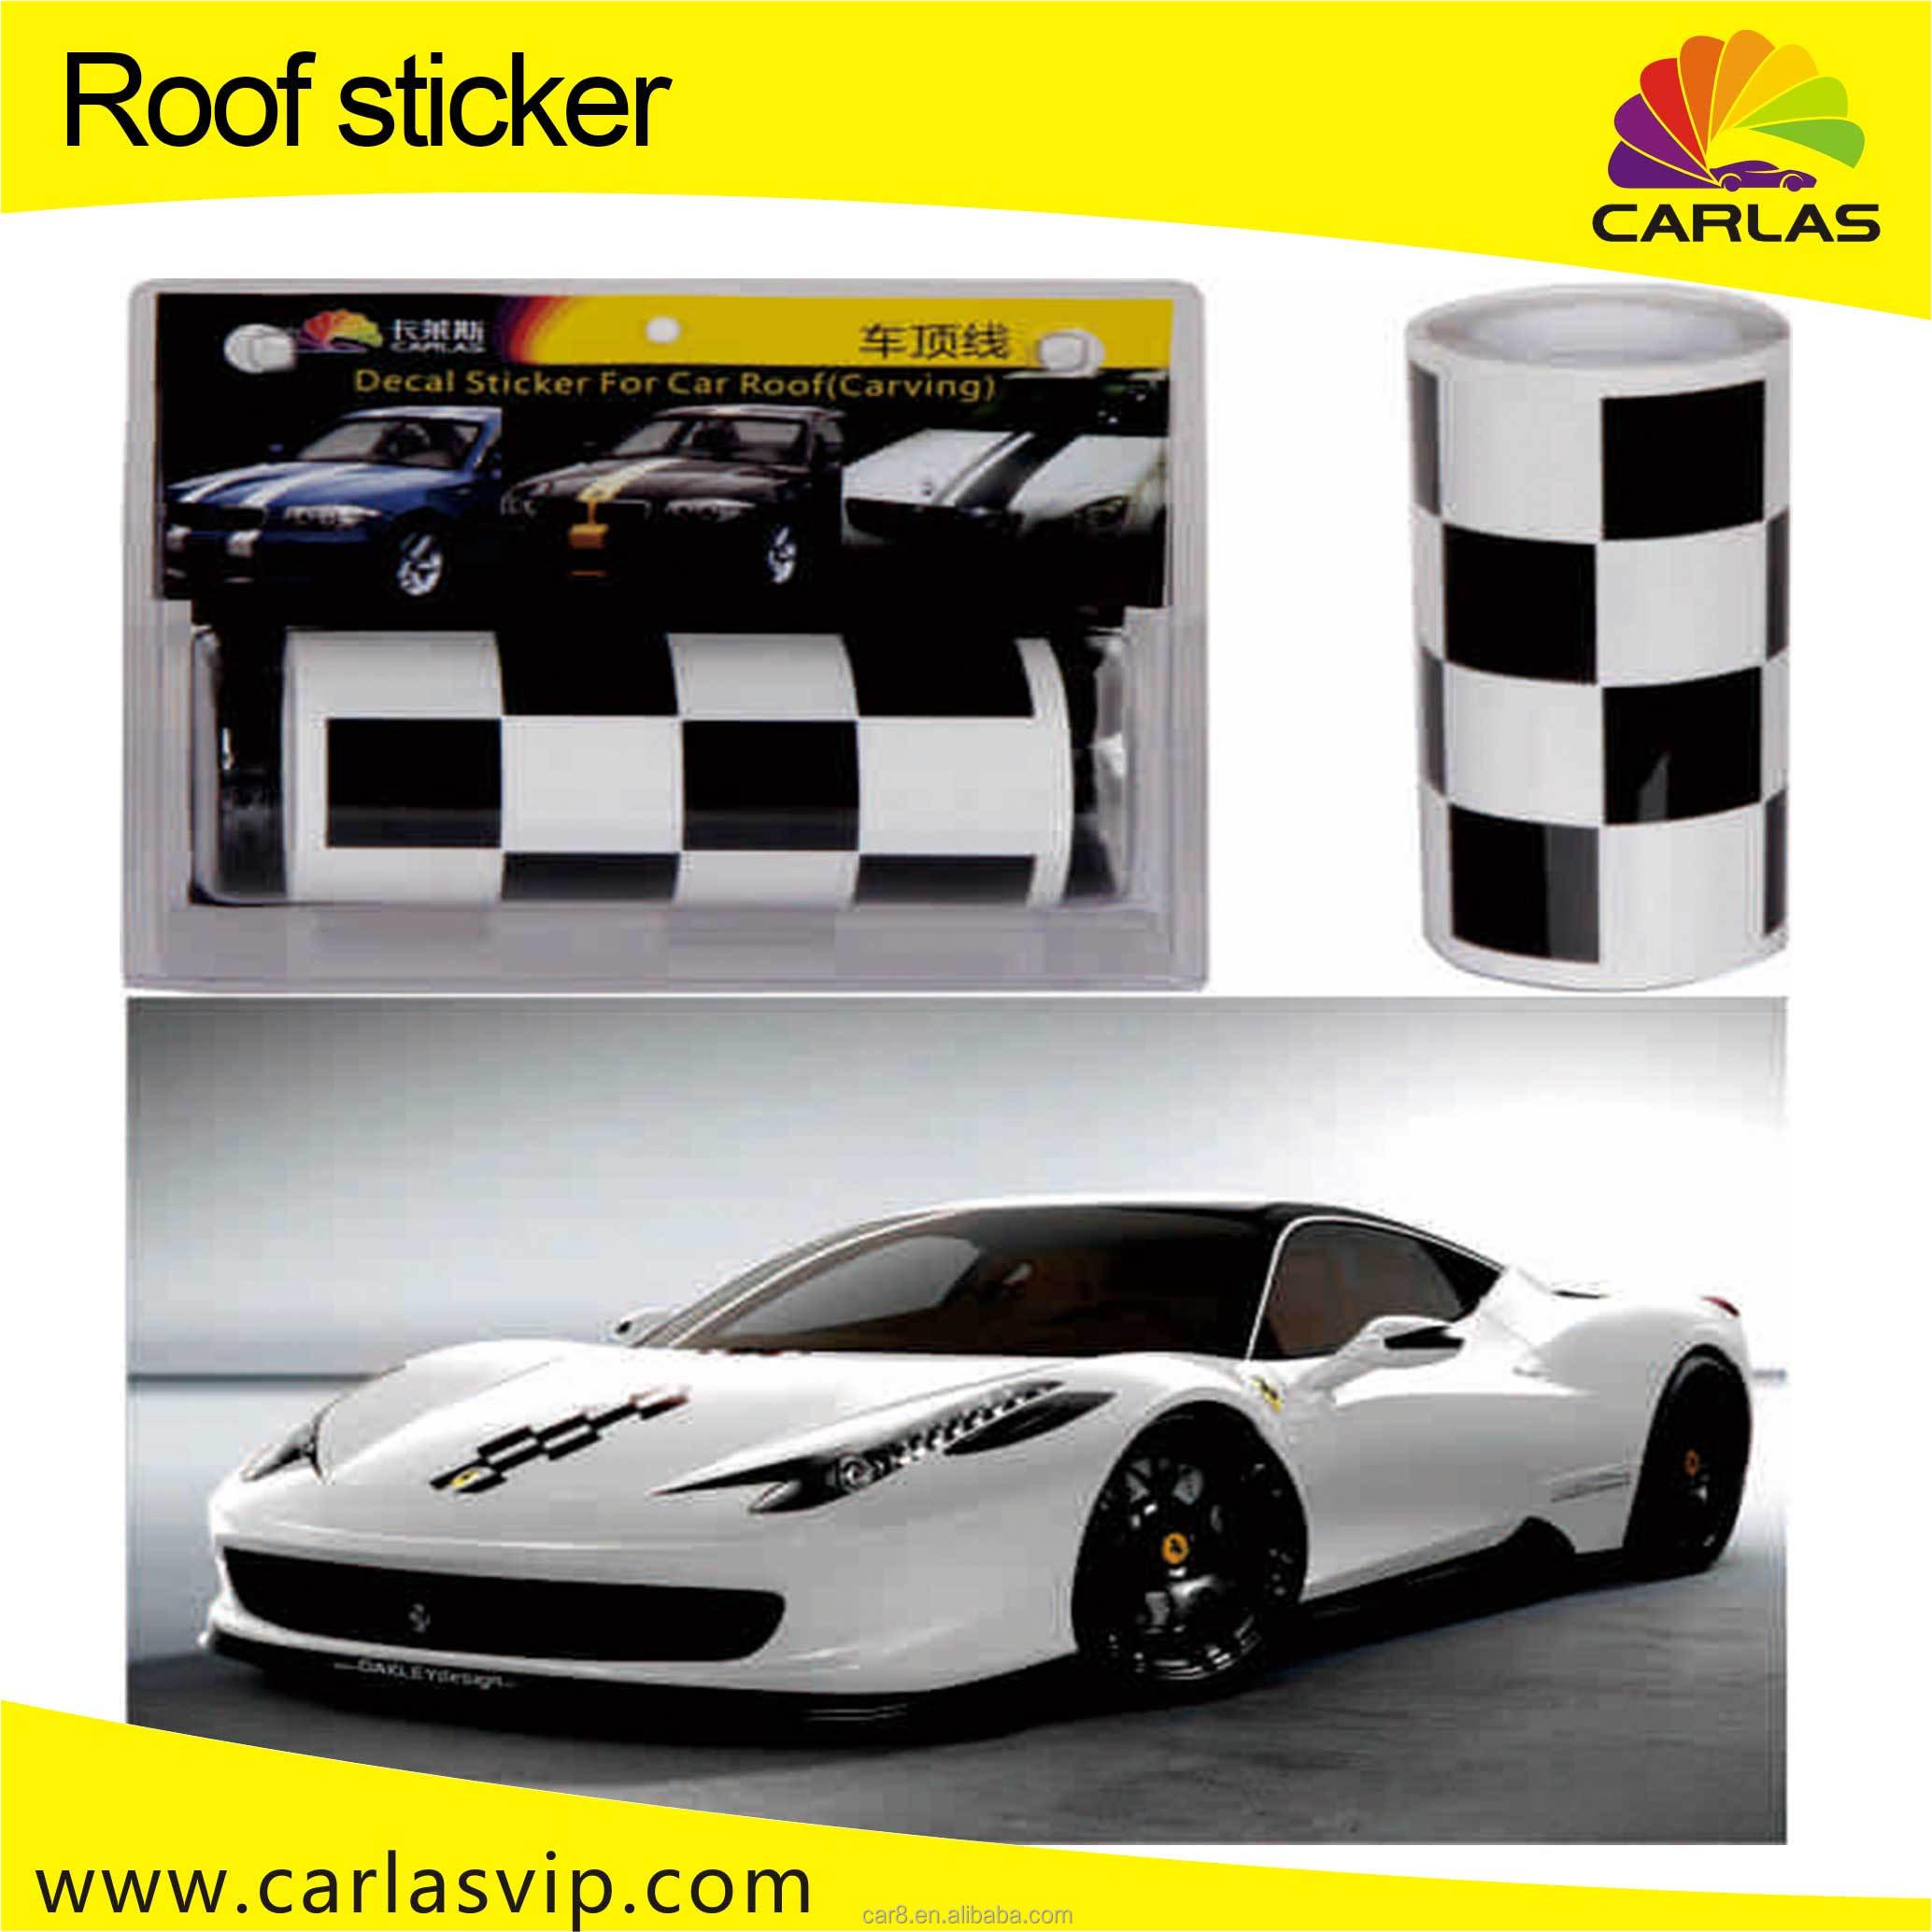 Car sticker design sample - Auto Roof Line Sticker Car Decal Sports Racing Stripes Buy Racing Stripes Decal Stickers Roof Line Sticker Product On Alibaba Com